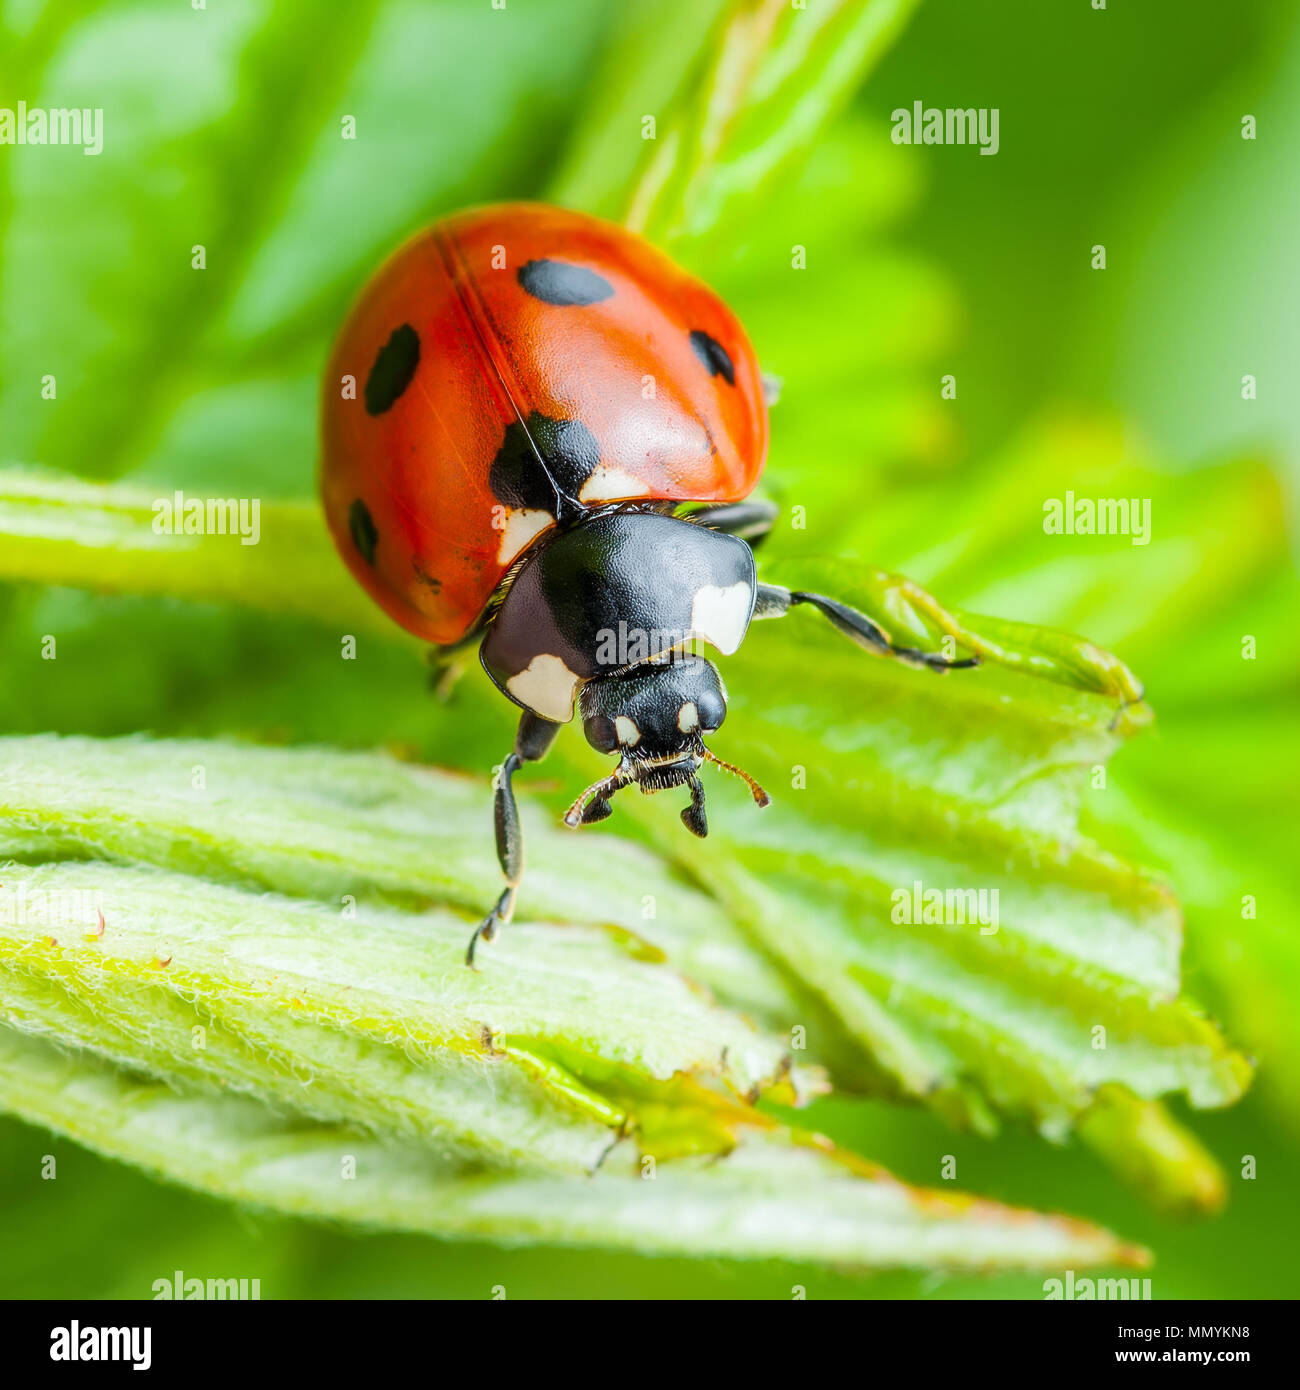 Ladybug Insect on Leaf Macro - Stock Image